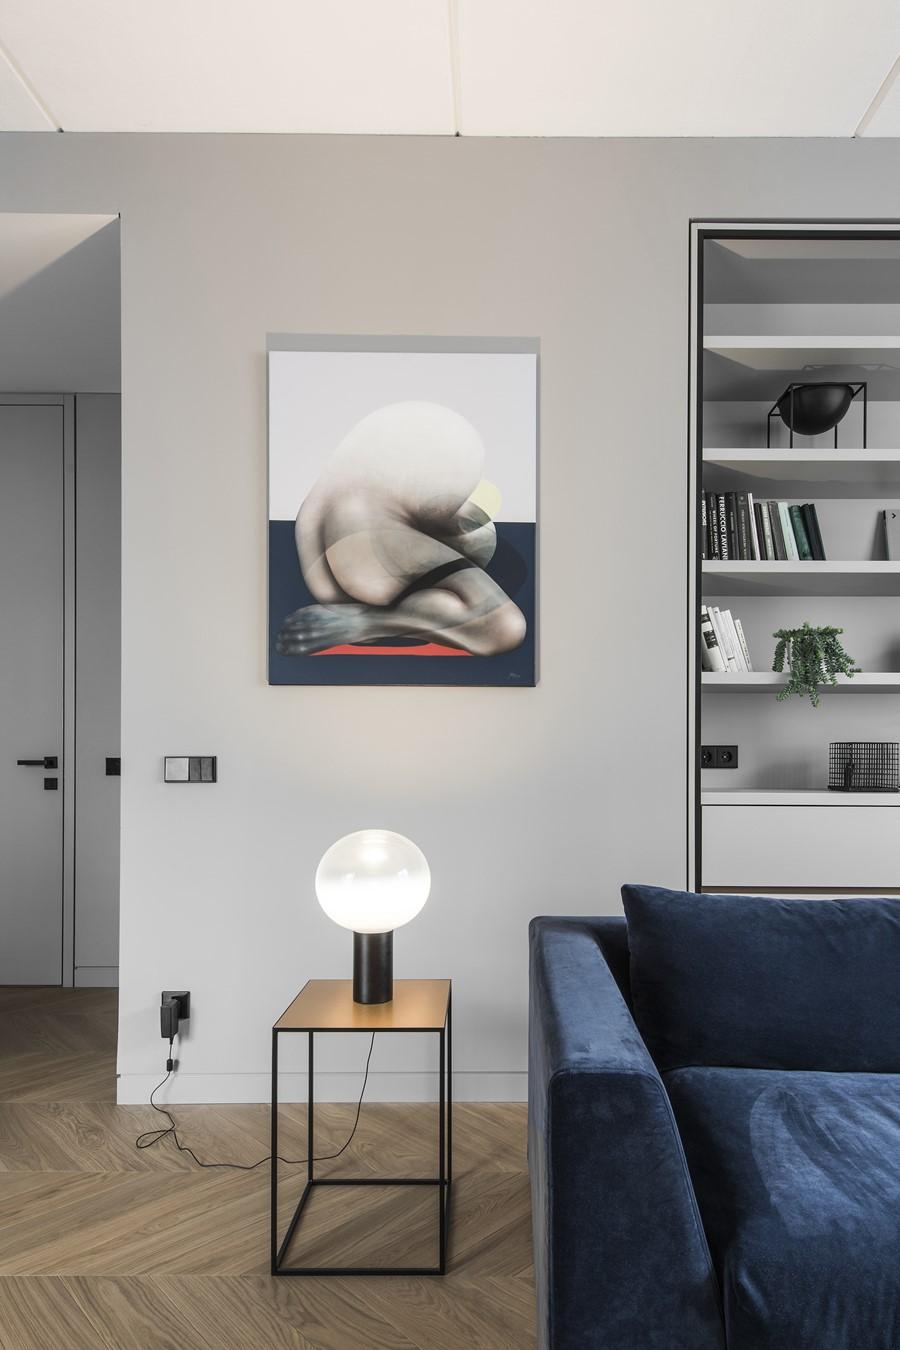 interior-design-by-normundas-vilkas-04